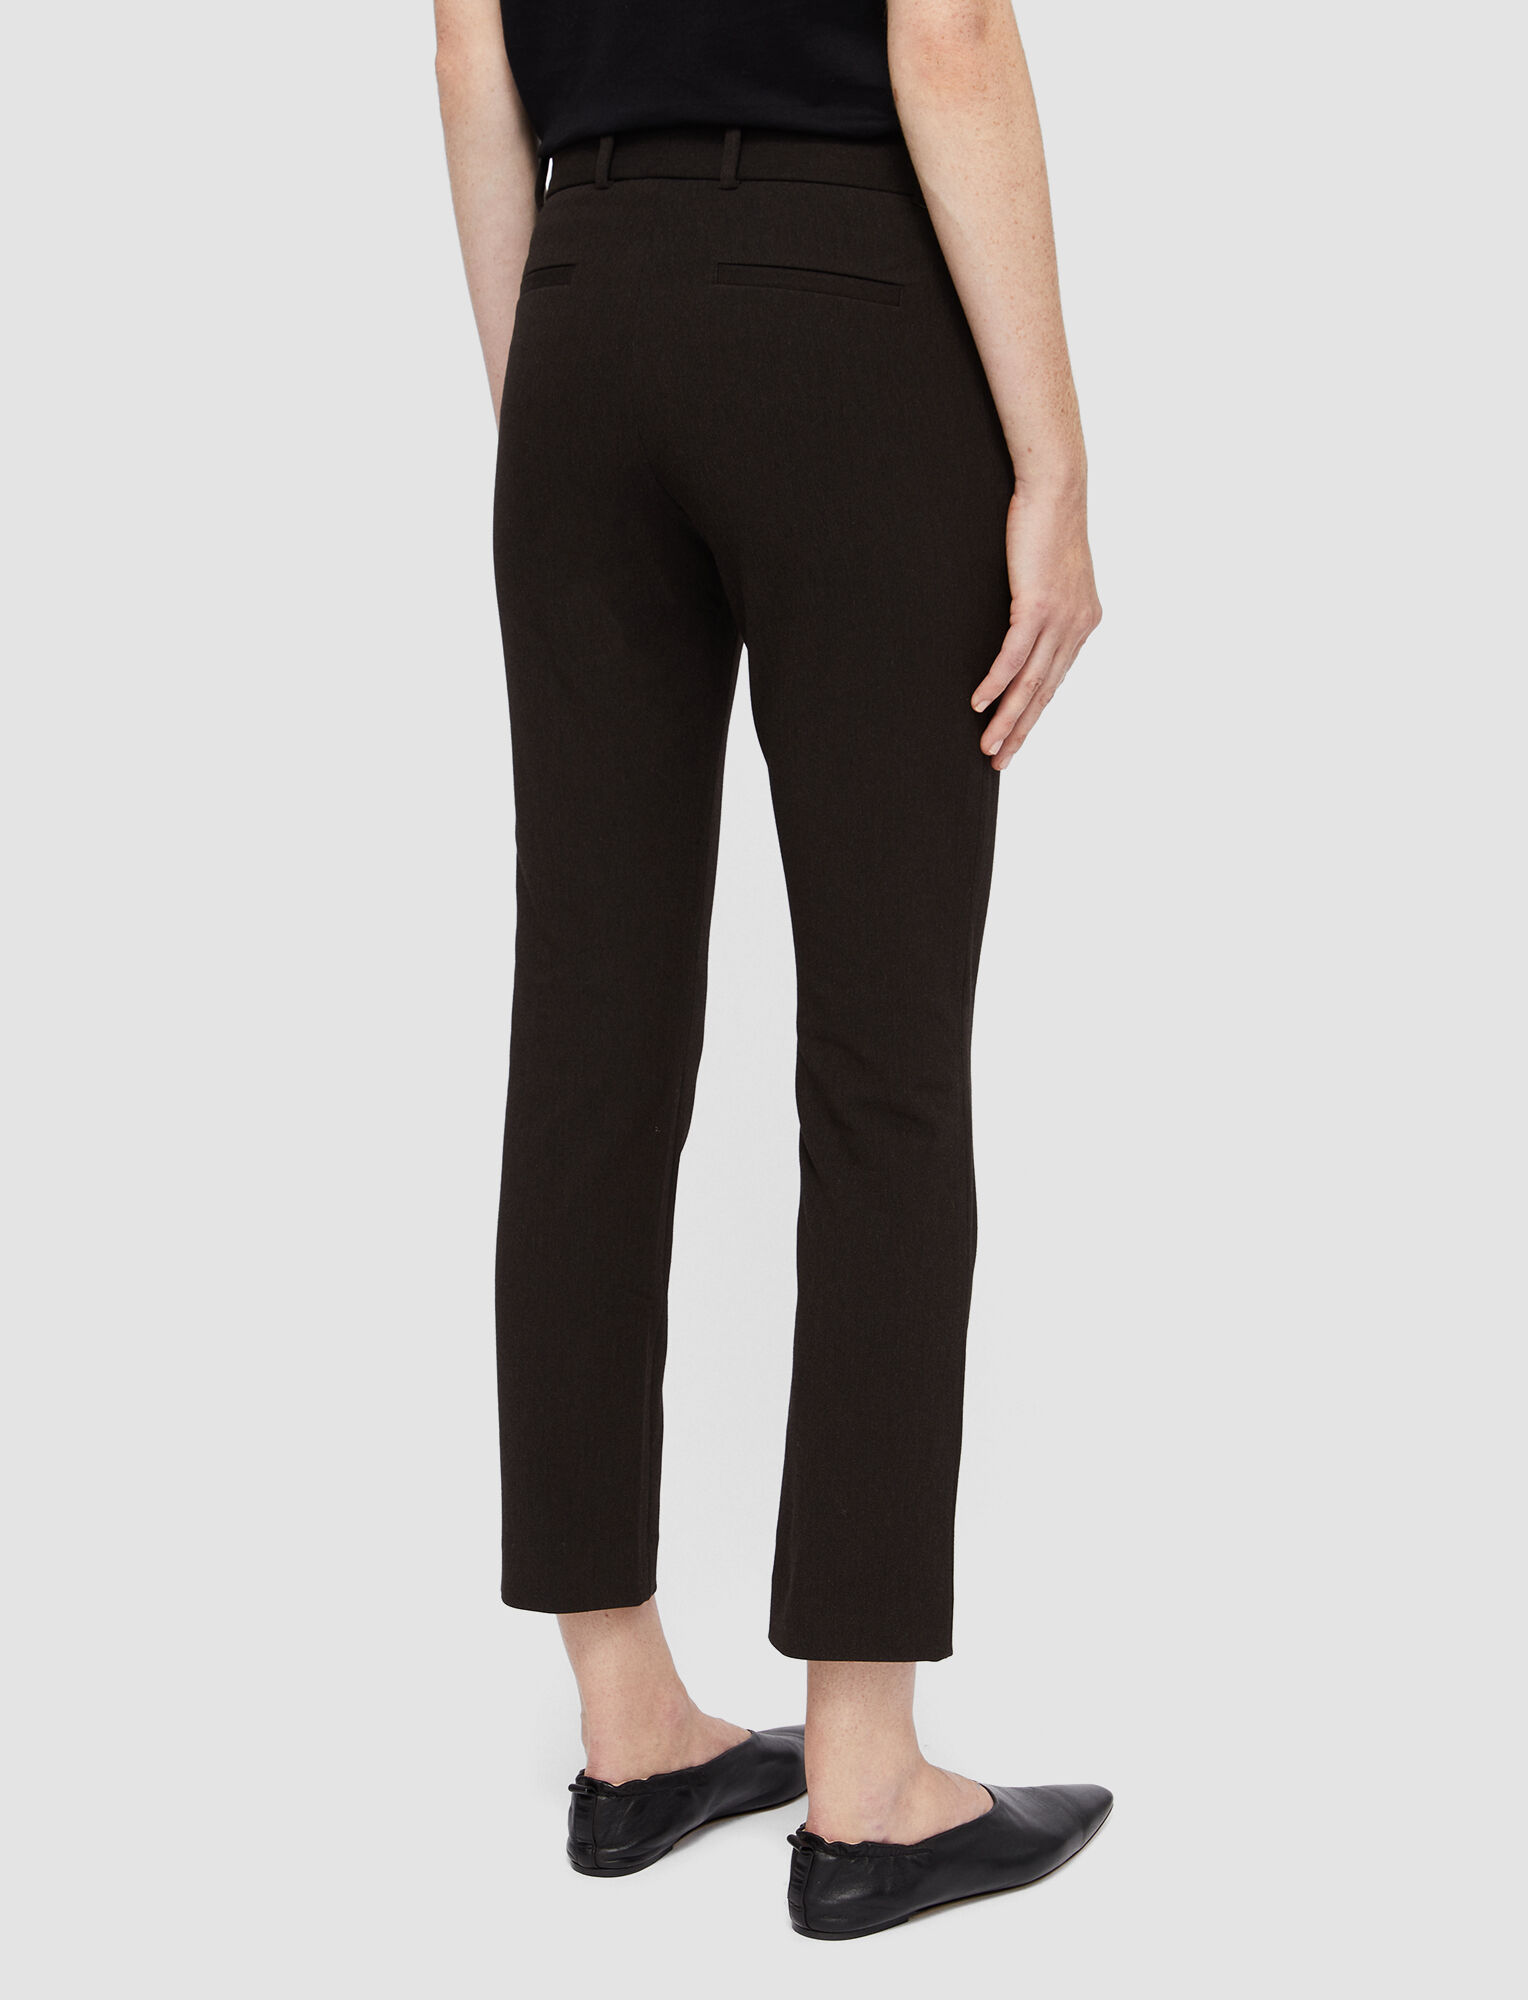 Joseph, Melange Gabardine Stretch New Eliston Trousers, in JAVA